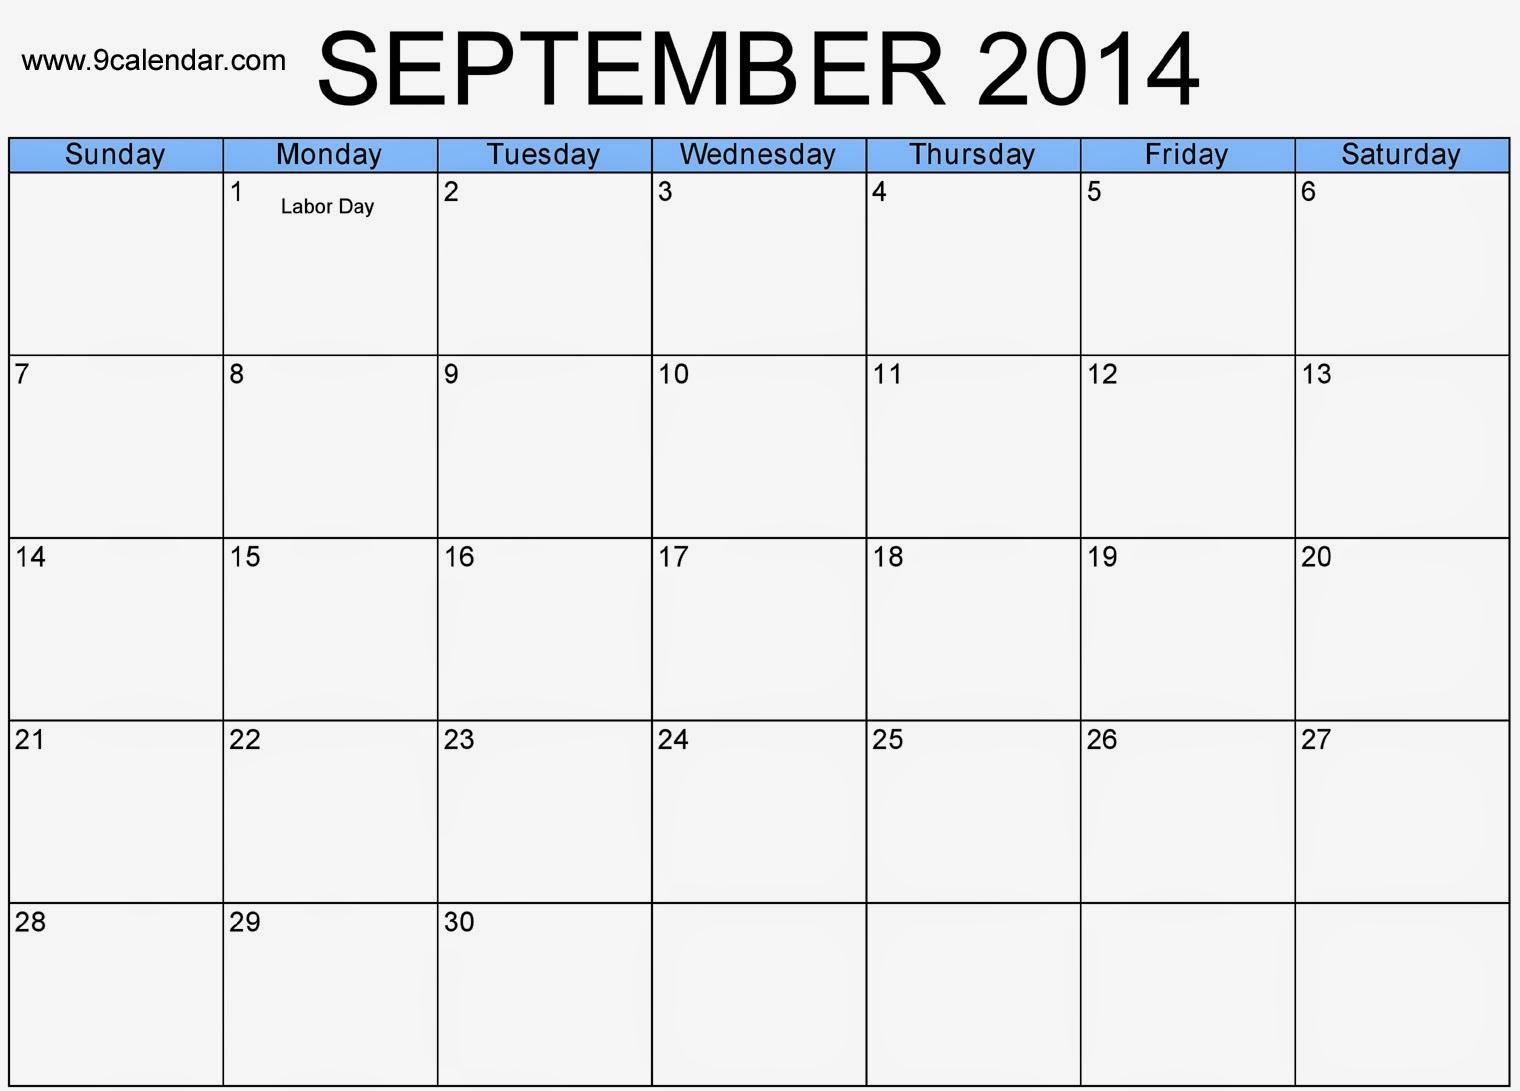 Online Free Printable Calendars 2012 Free Monthly Calendar Or Planner Printable Online Free Printable Calendar 2017 Download September 2014 Calendar